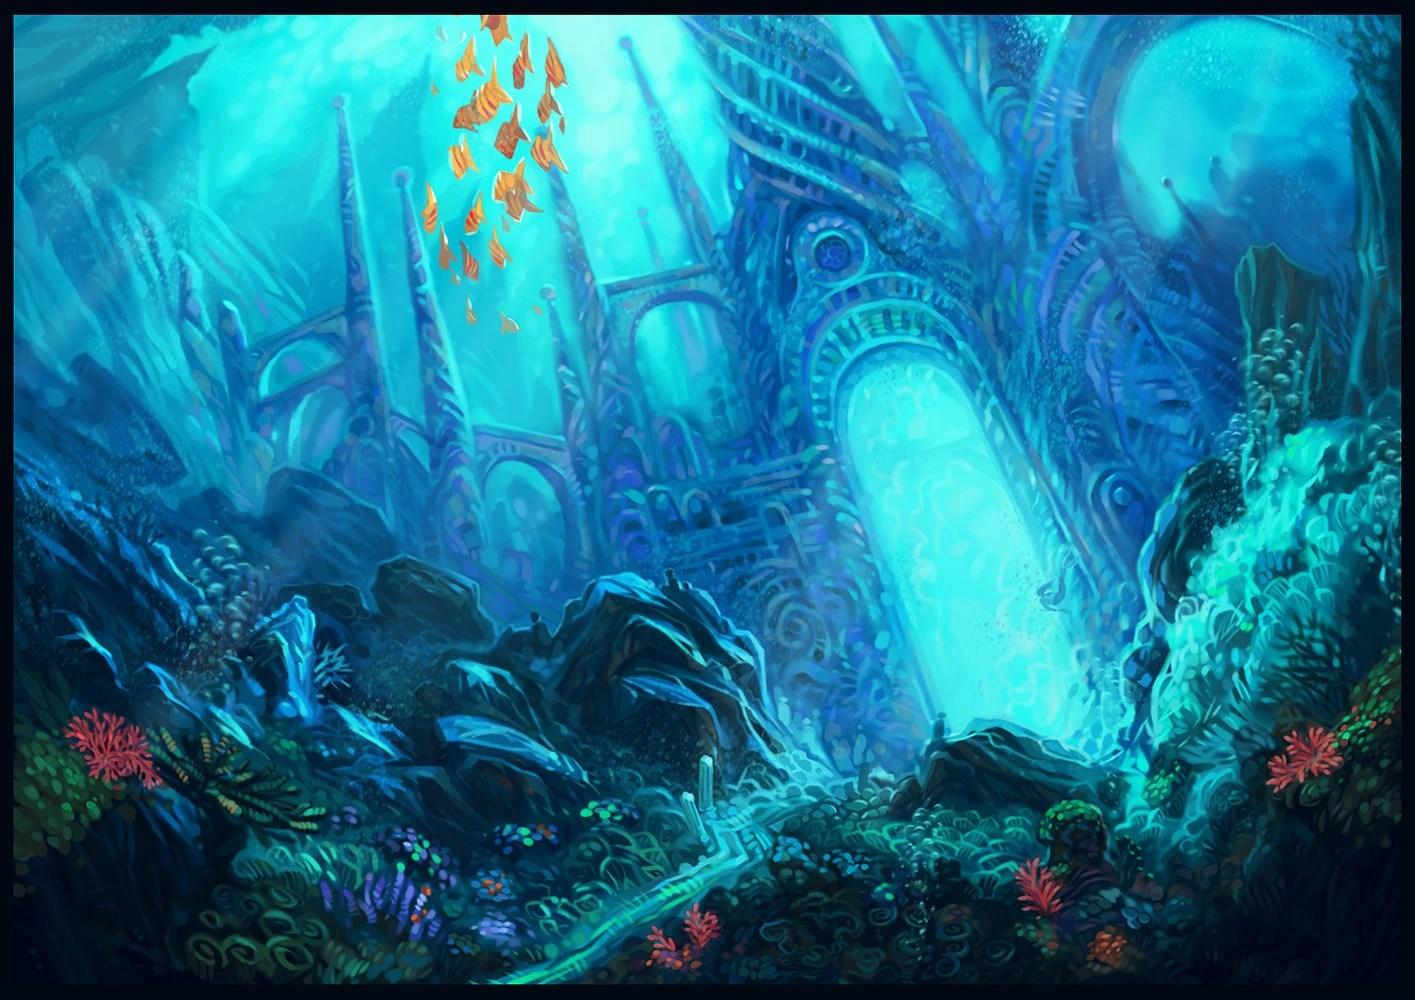 Moveing Gravity Falls Wallpapers Image Underwater Kingdom Jpg Gravity Falls Roleplay